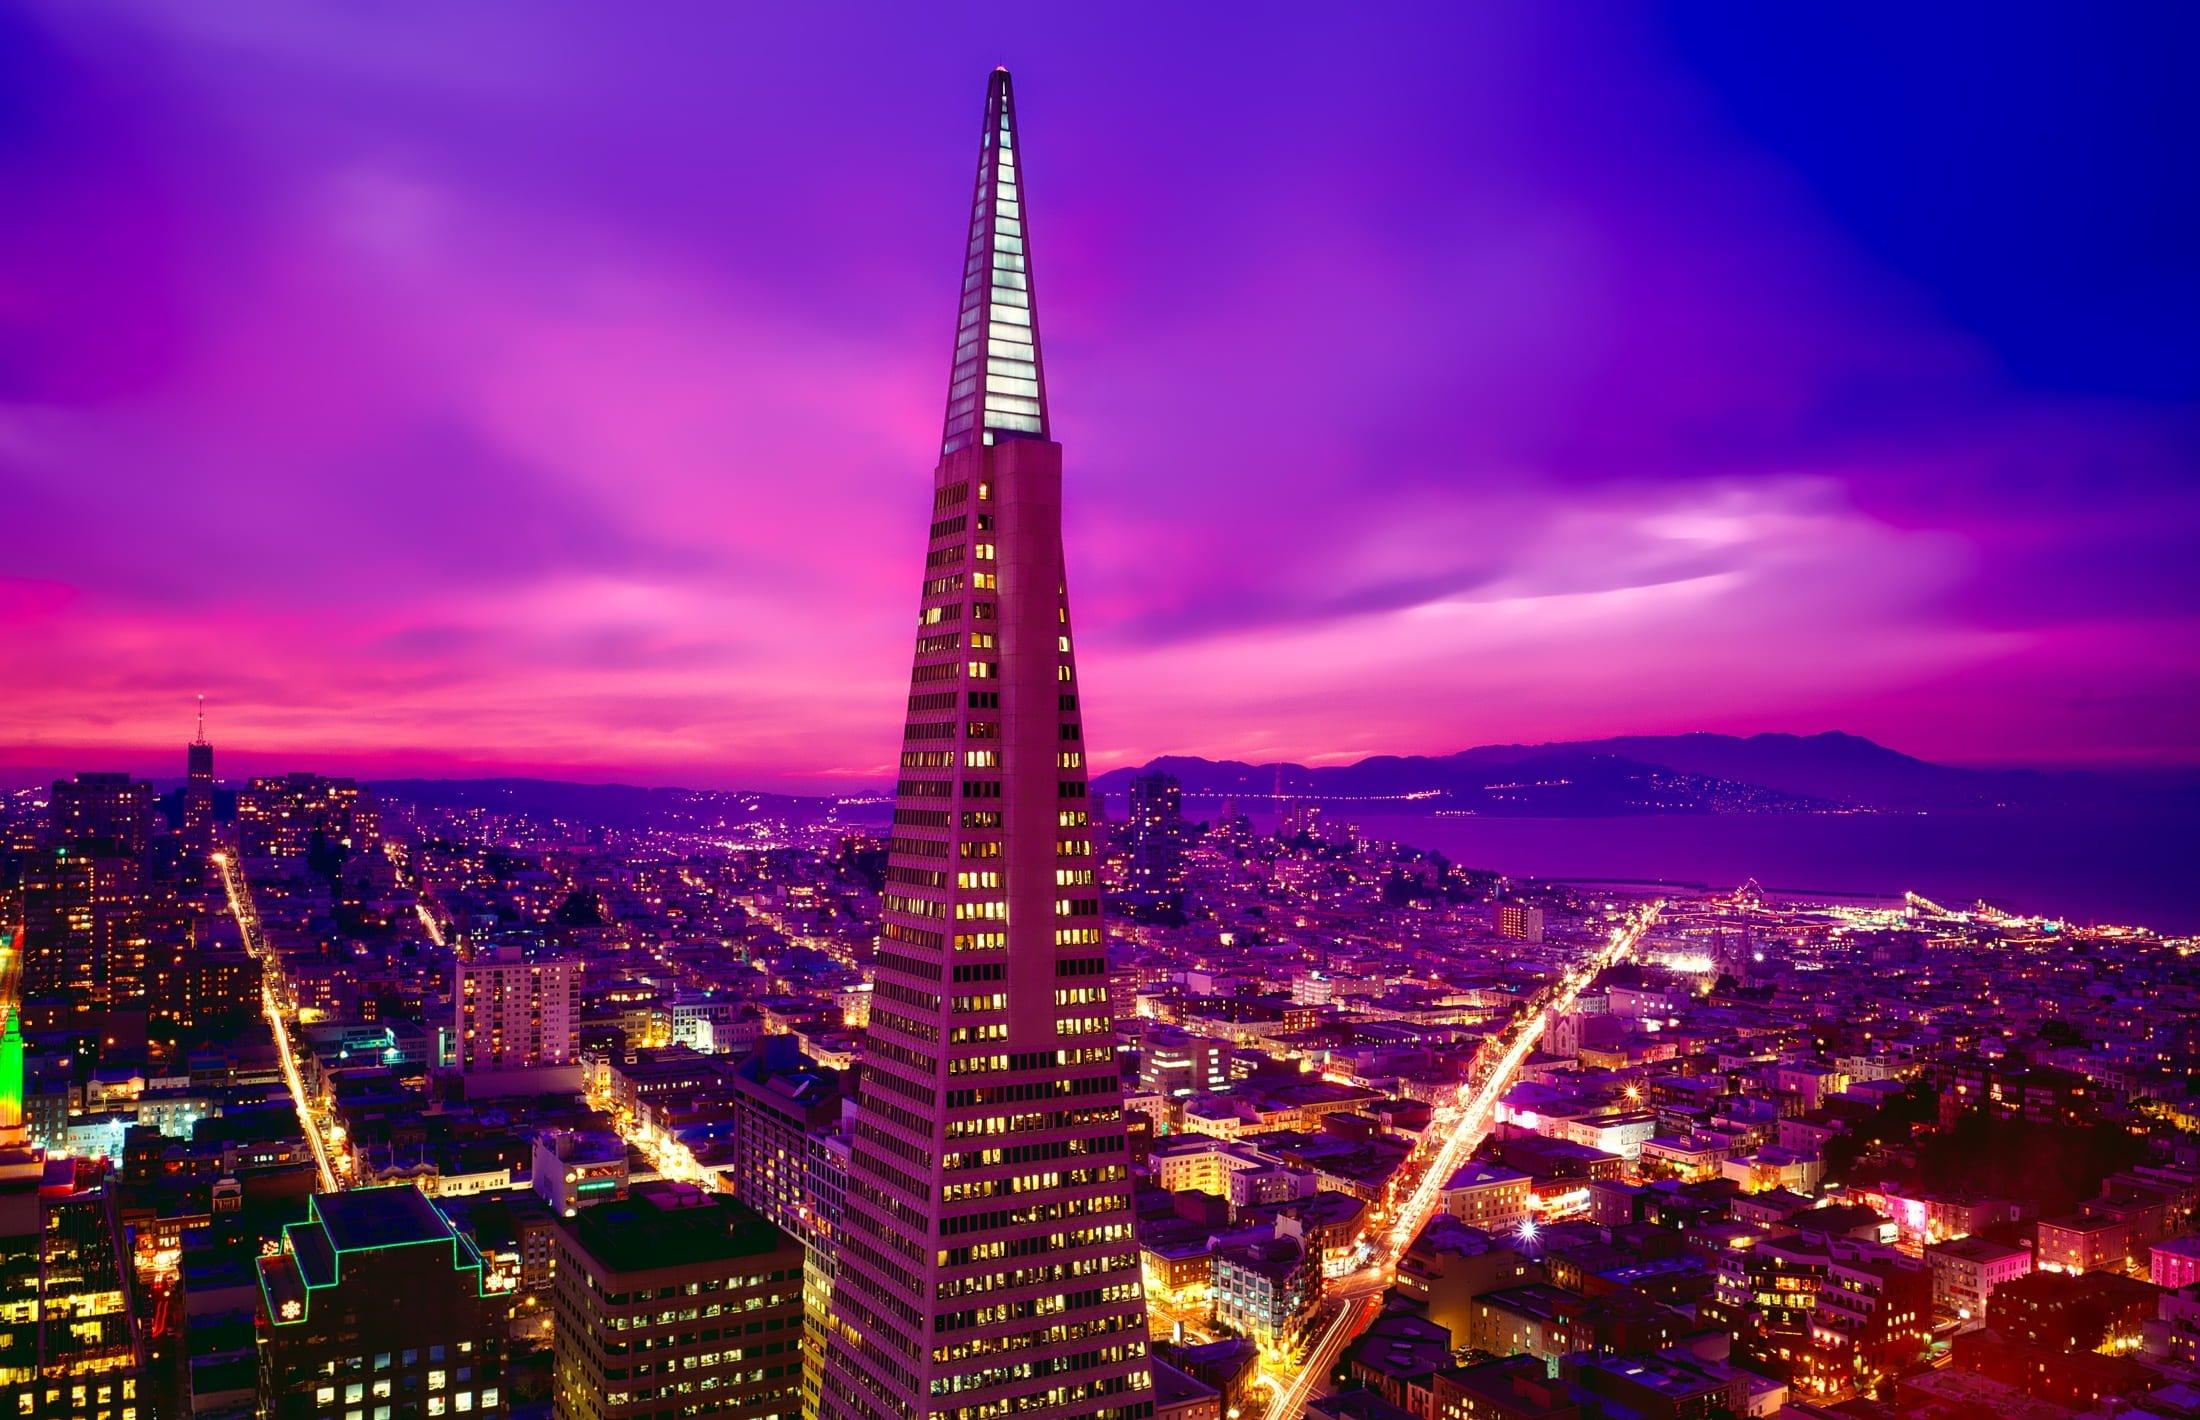 San Francisco Transamerica Pyramid - photo by Pikrepo under CC0